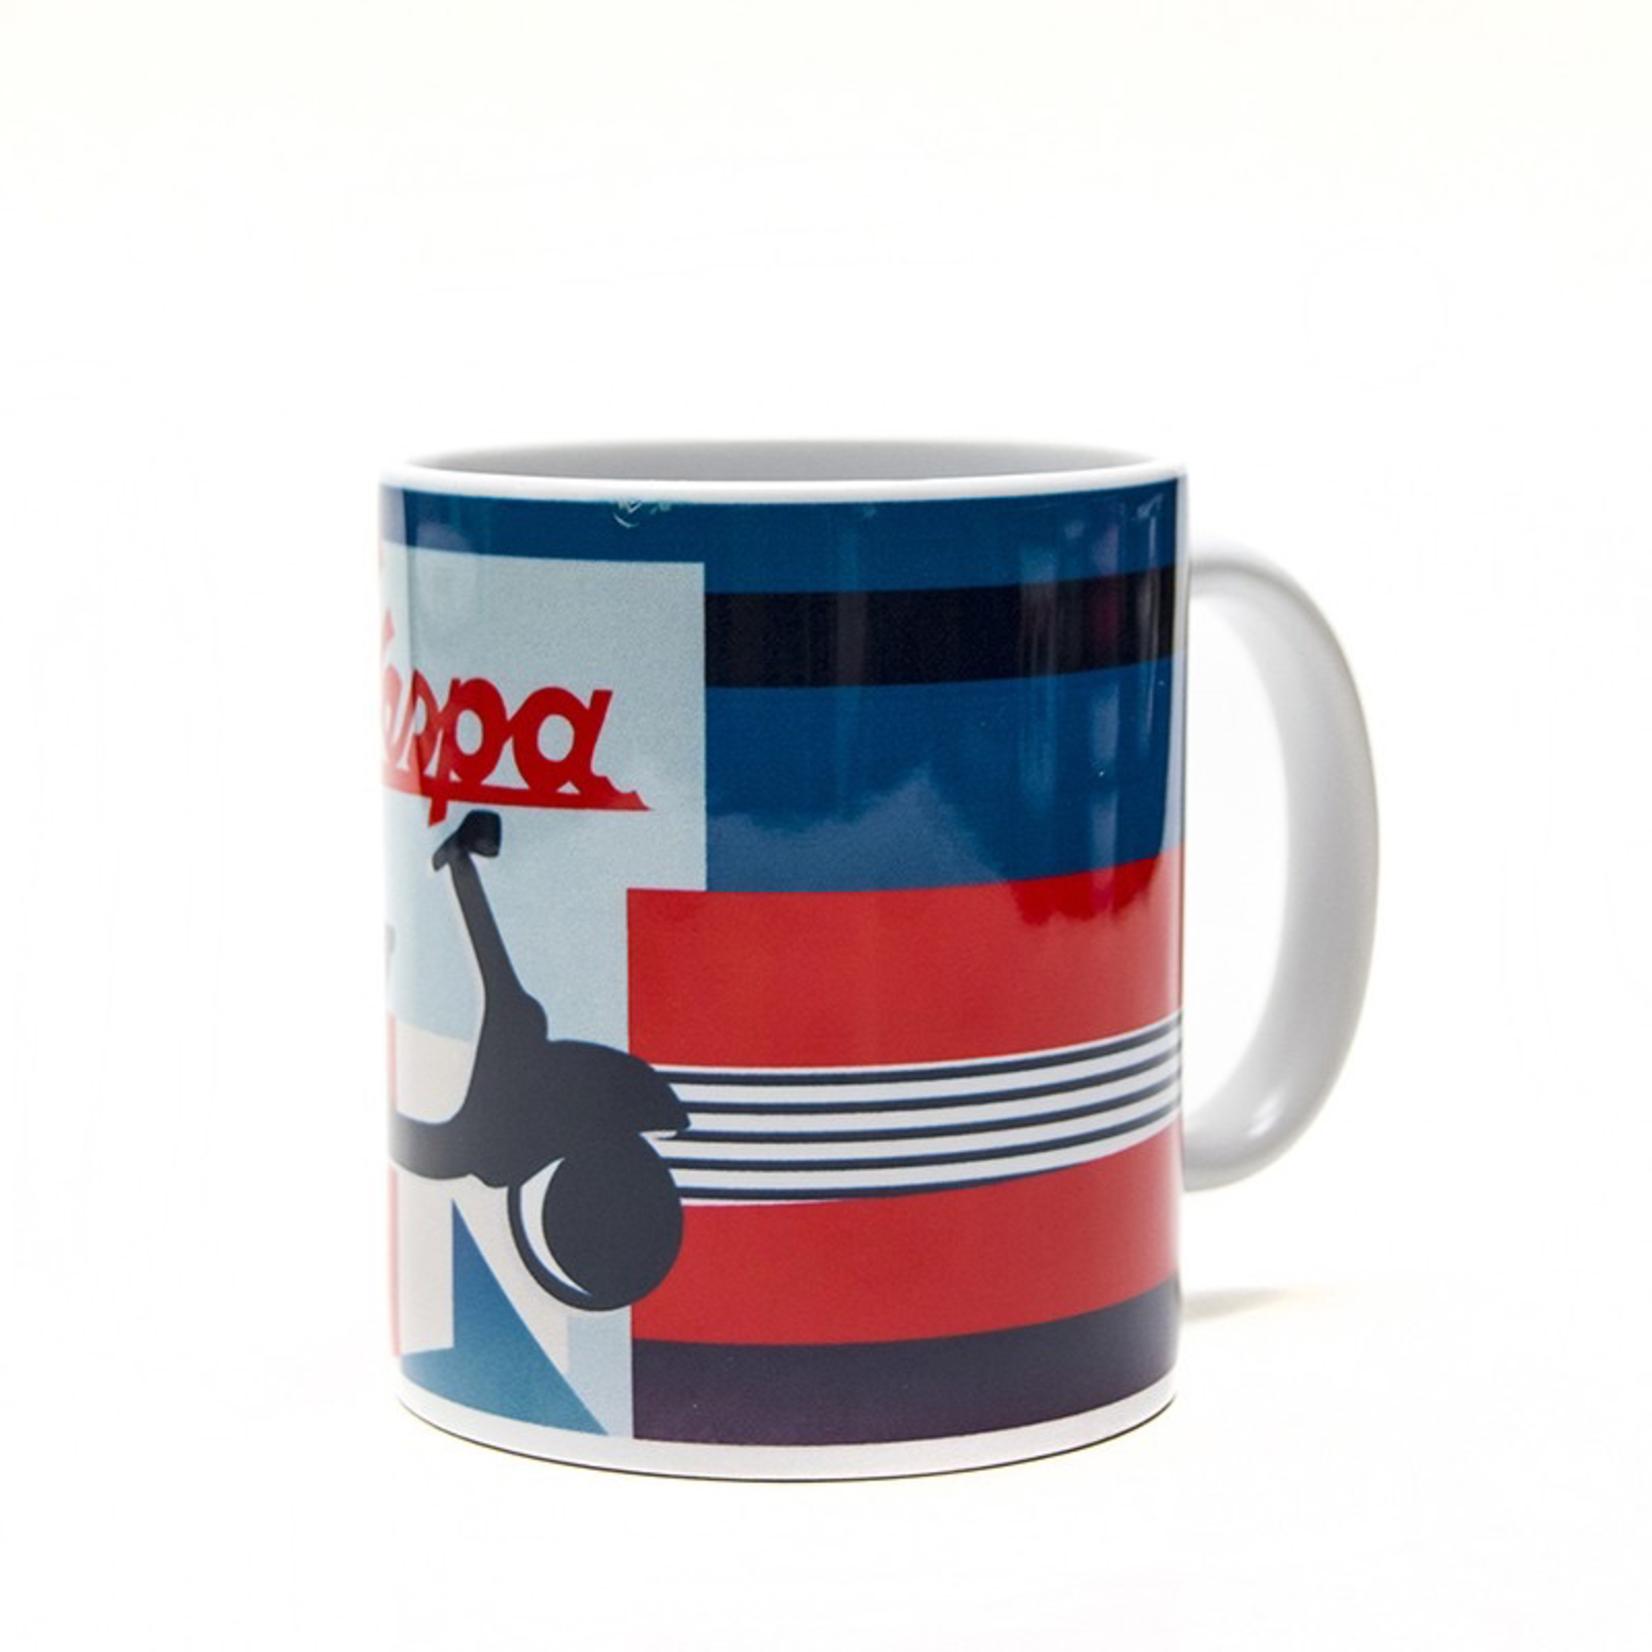 Lifestyle Mug, Vespa Red Logo Blue